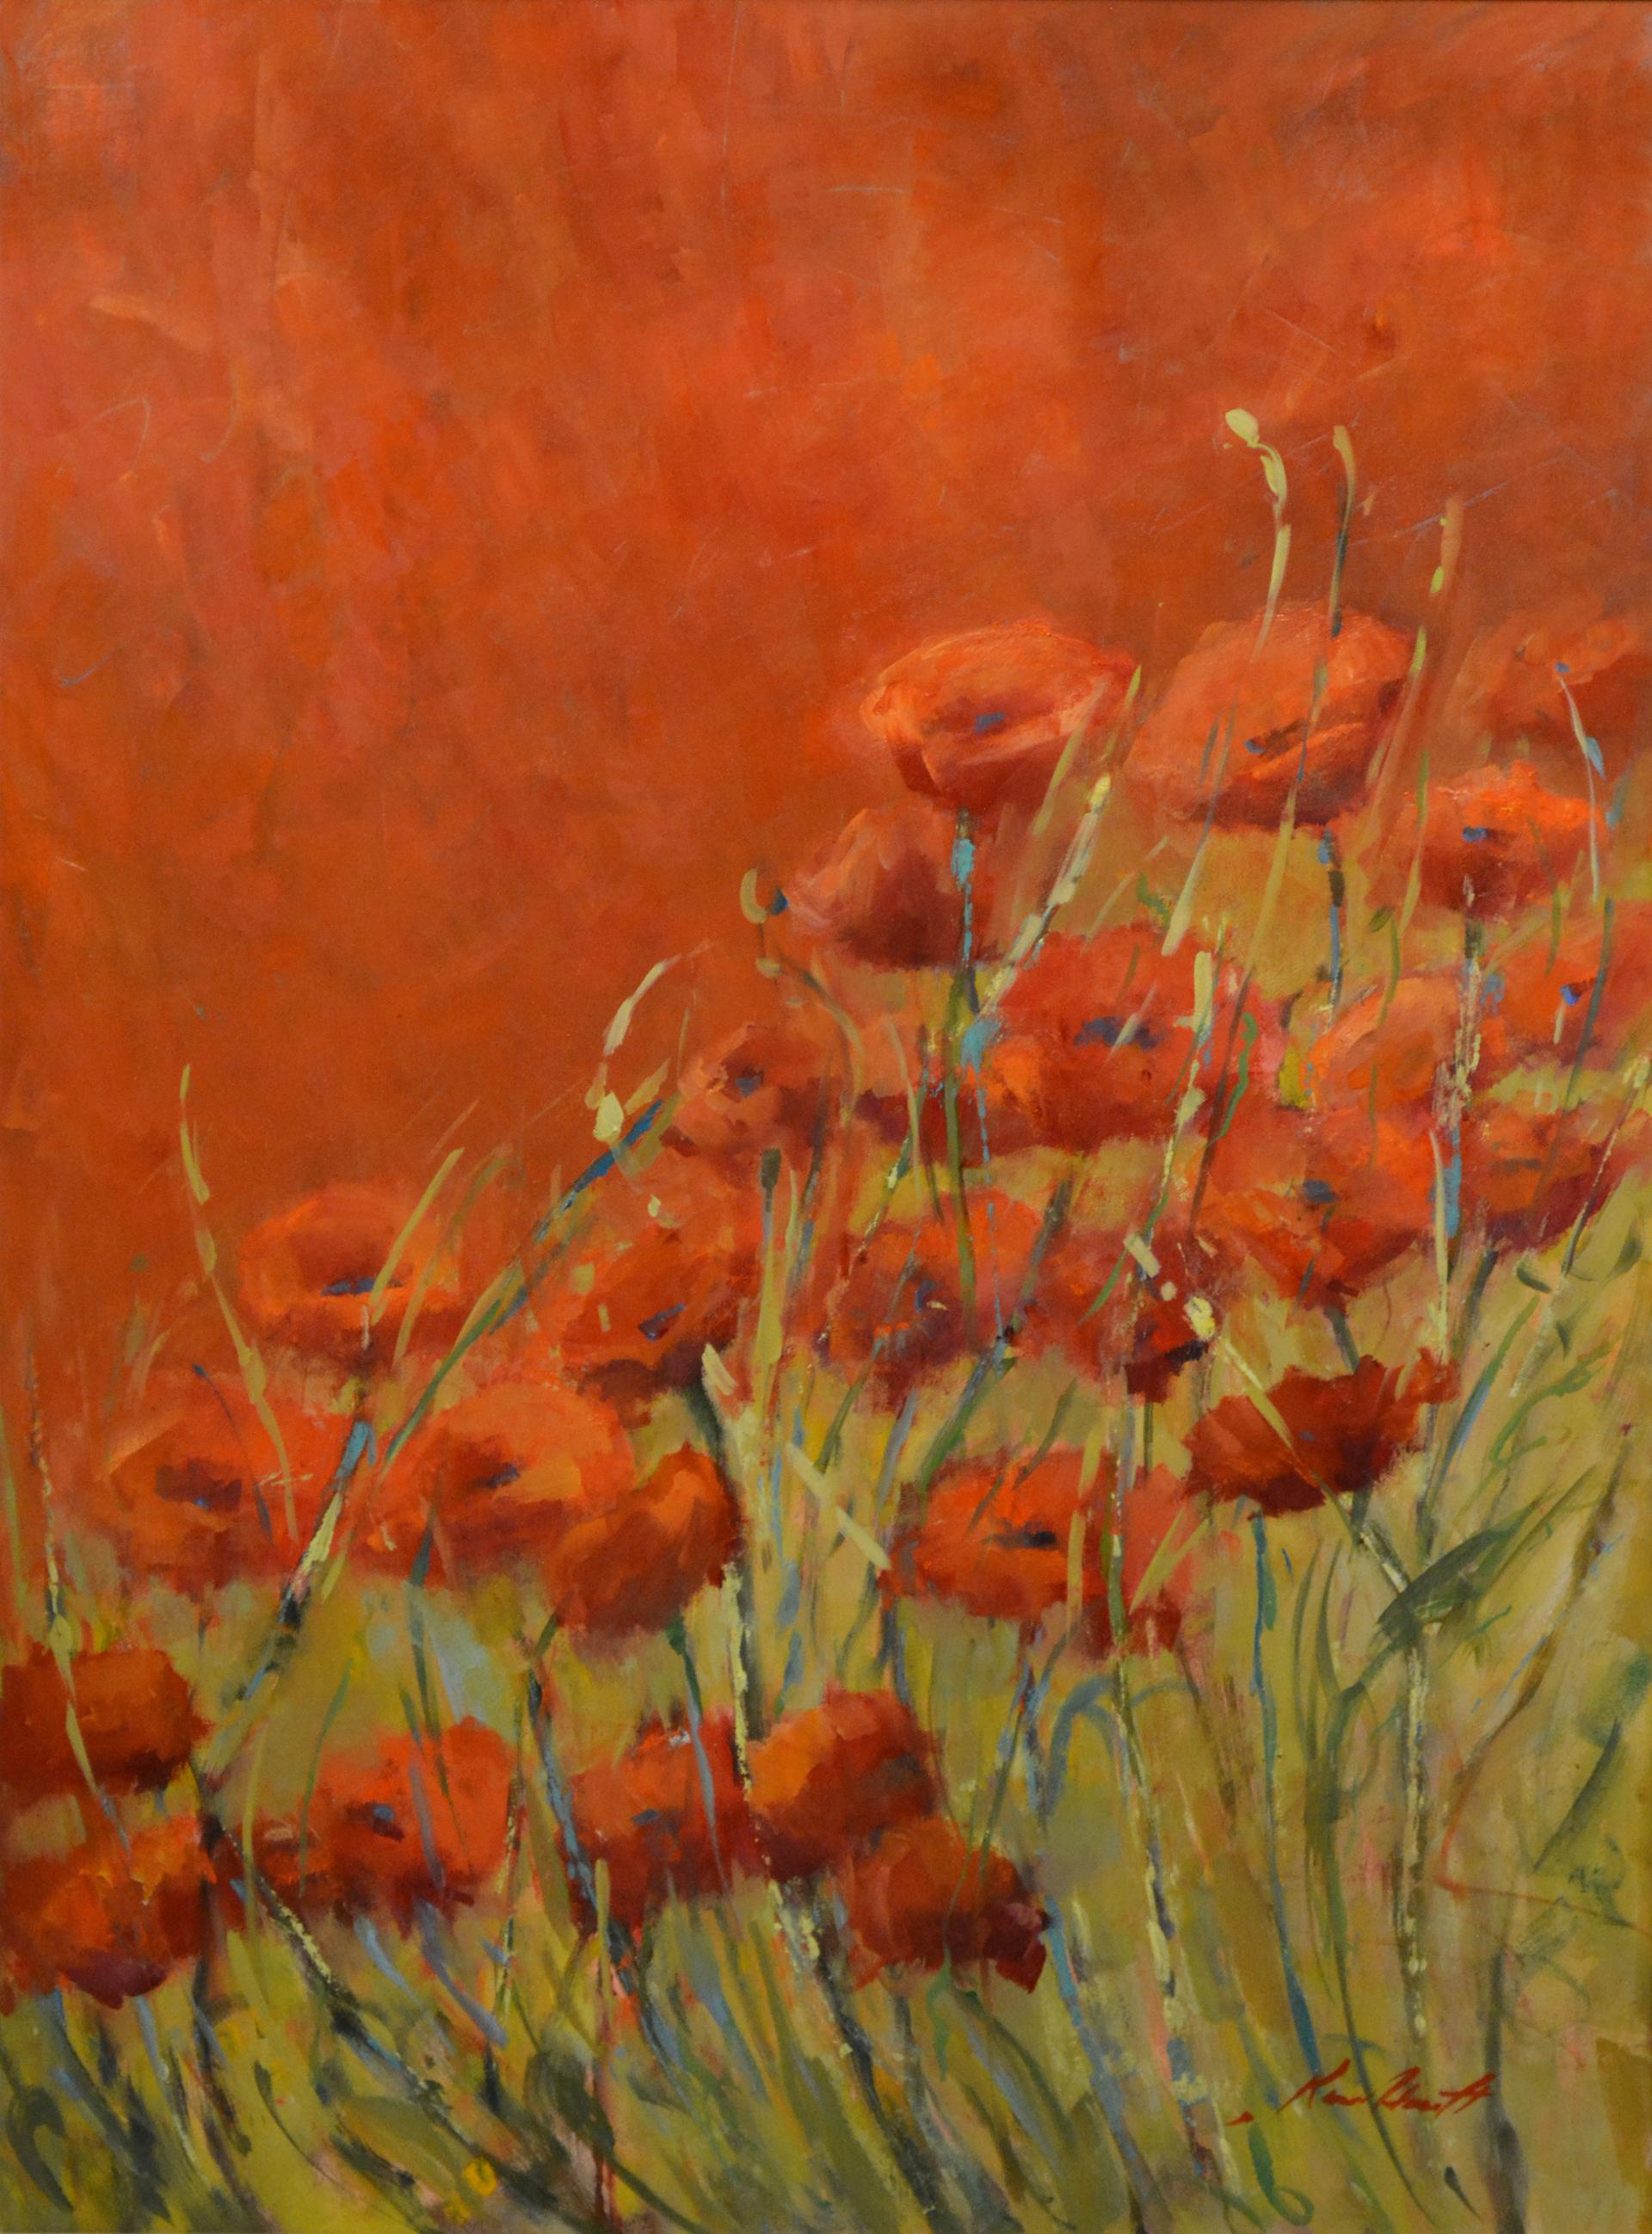 Feeling Joyful! by Karen Hewitt Hagan